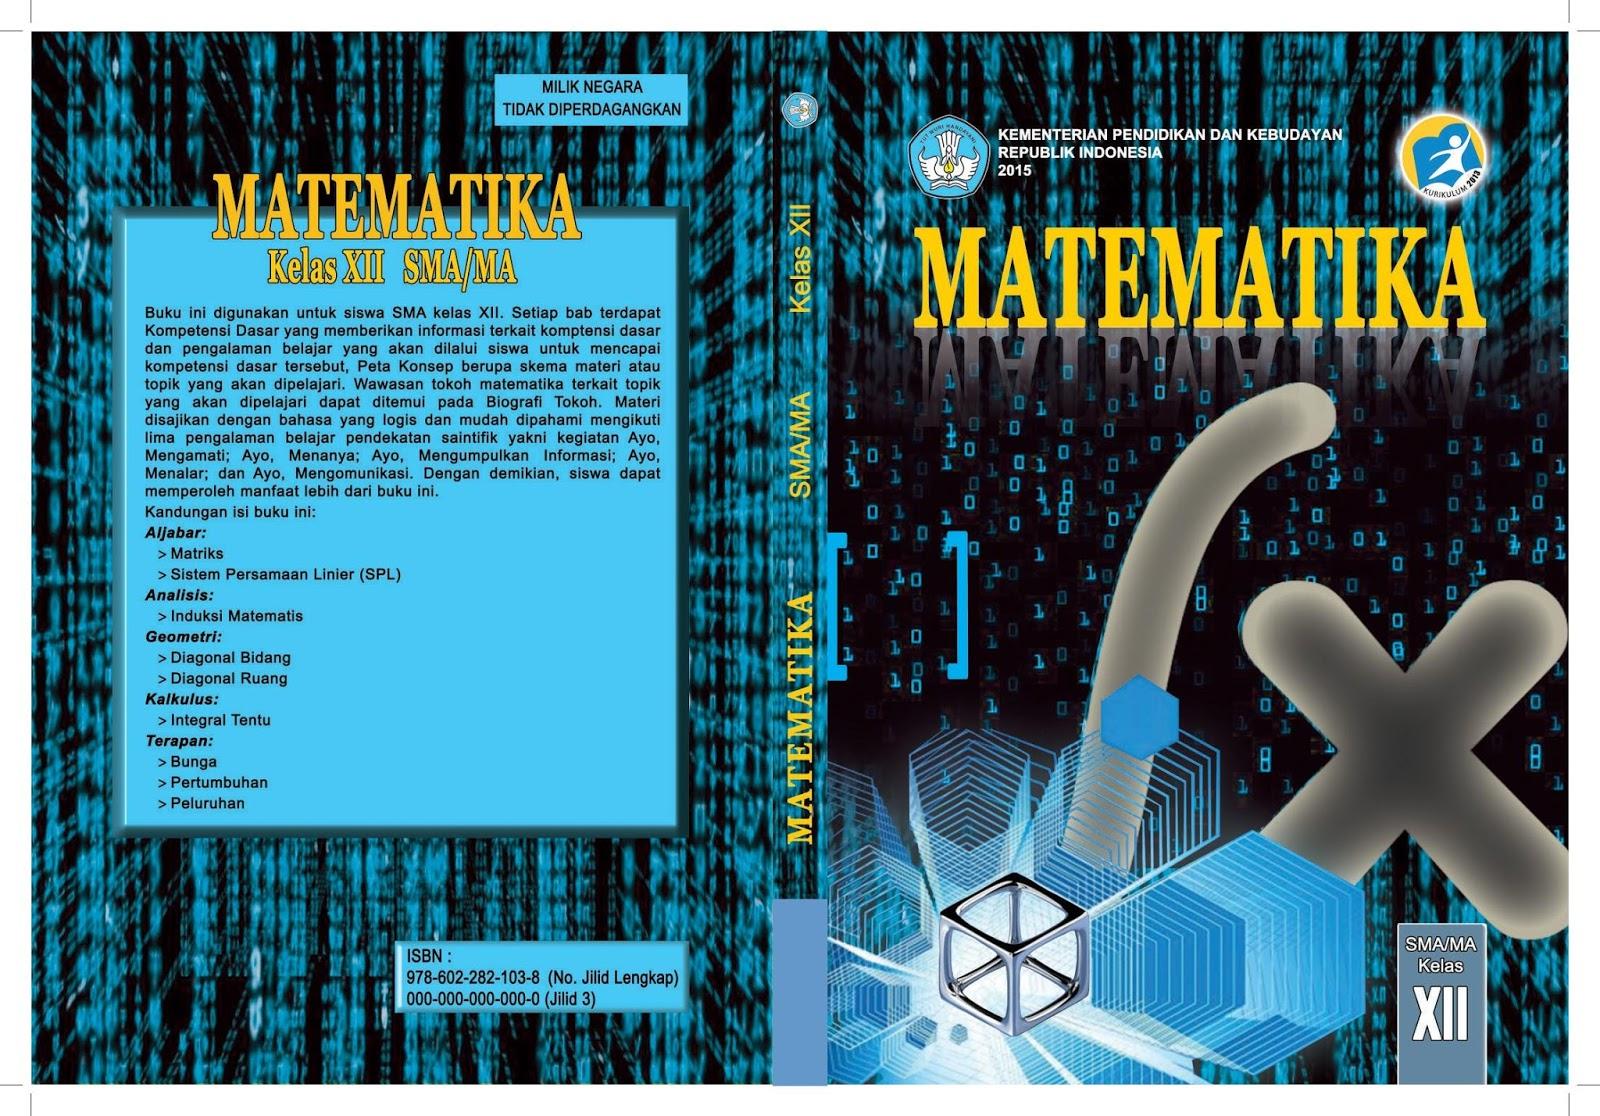 Kurikulum kelas xi 2013 kimia pdf materi